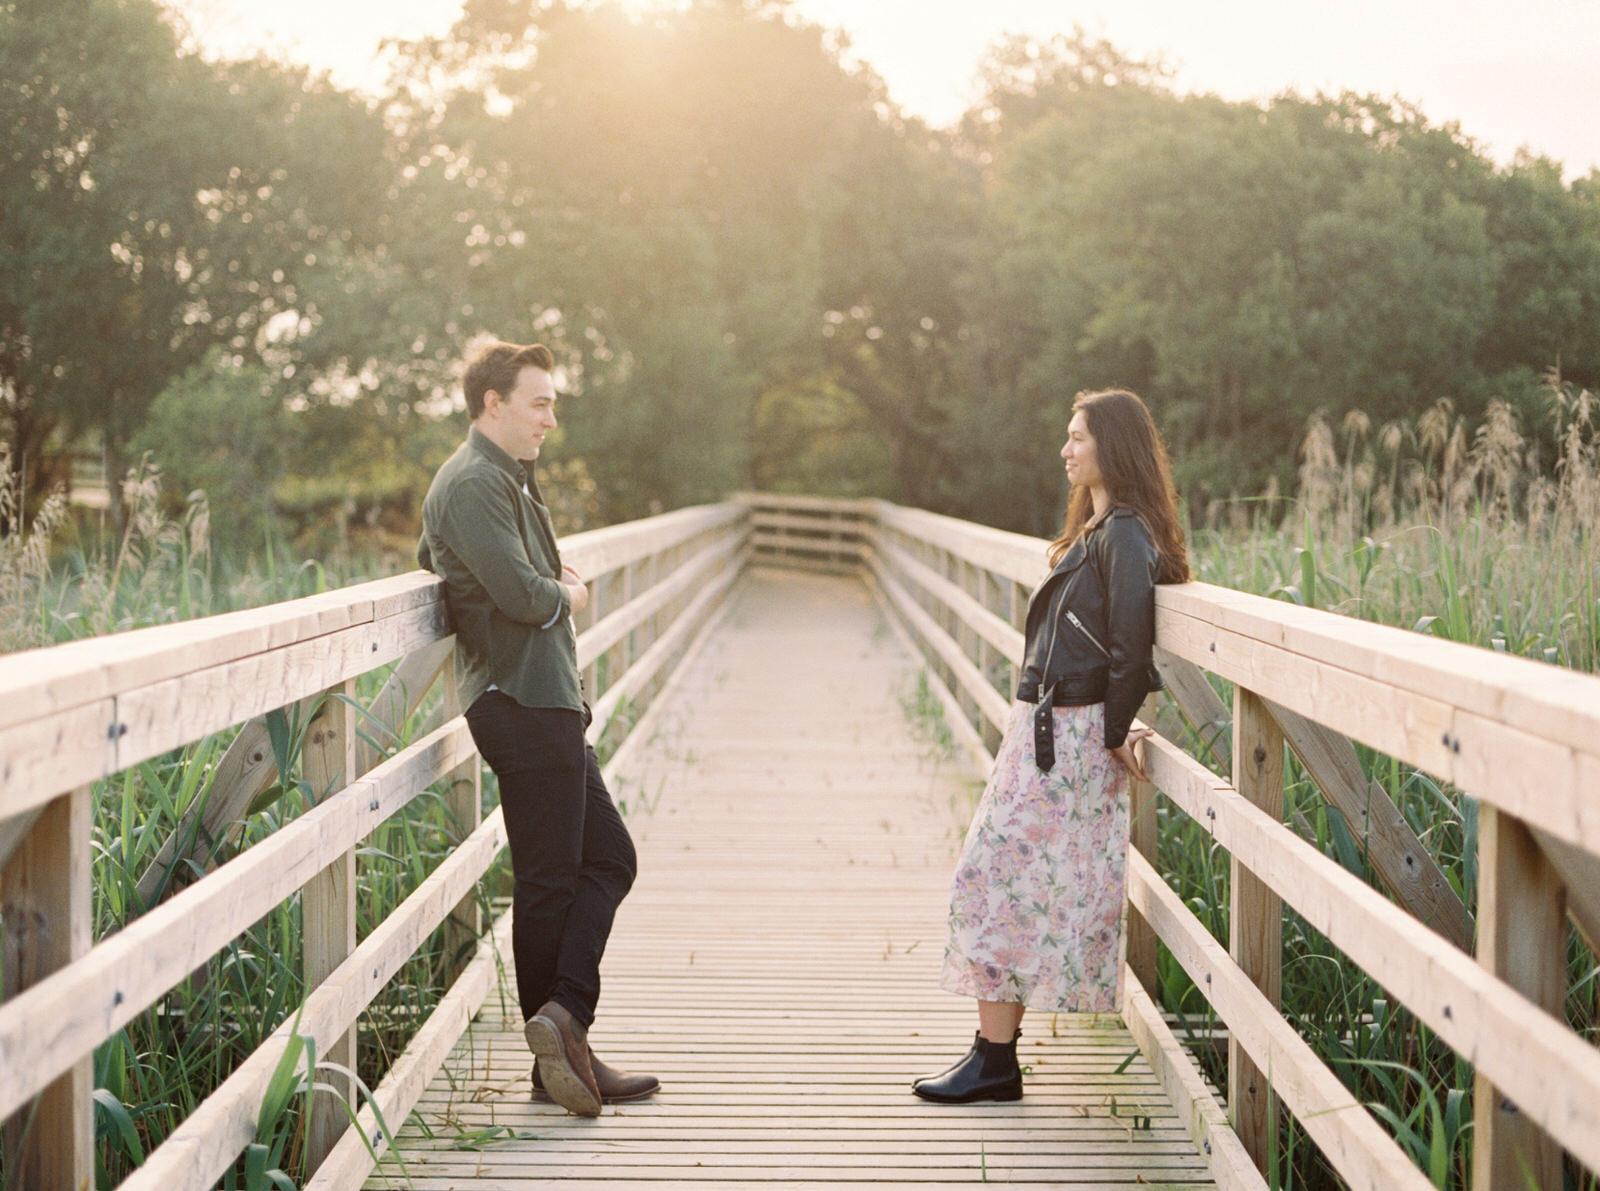 Sai&JackPre-weddingshootbyImogenXiana-71